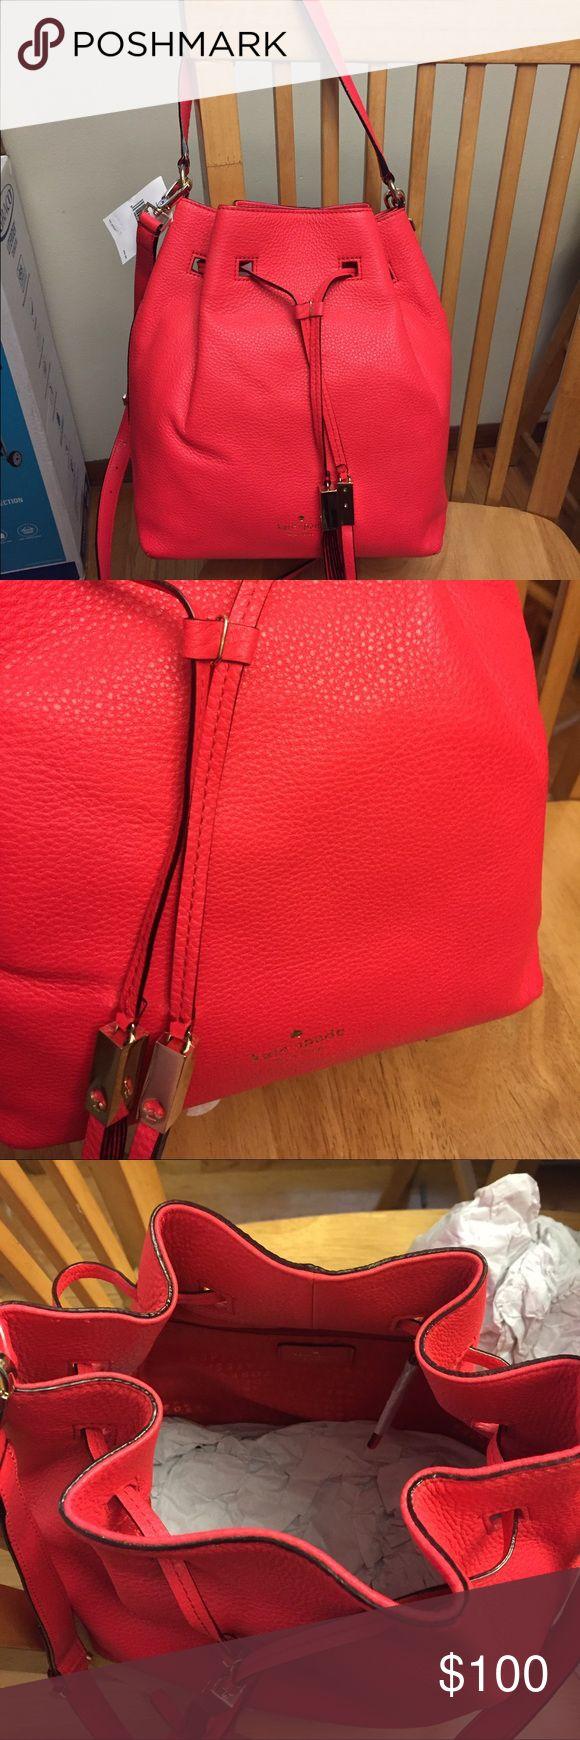 Kate Spade Delaina drawstring purse BNWT in beautiful bright geranium color! kate spade Bags Crossbody Bags